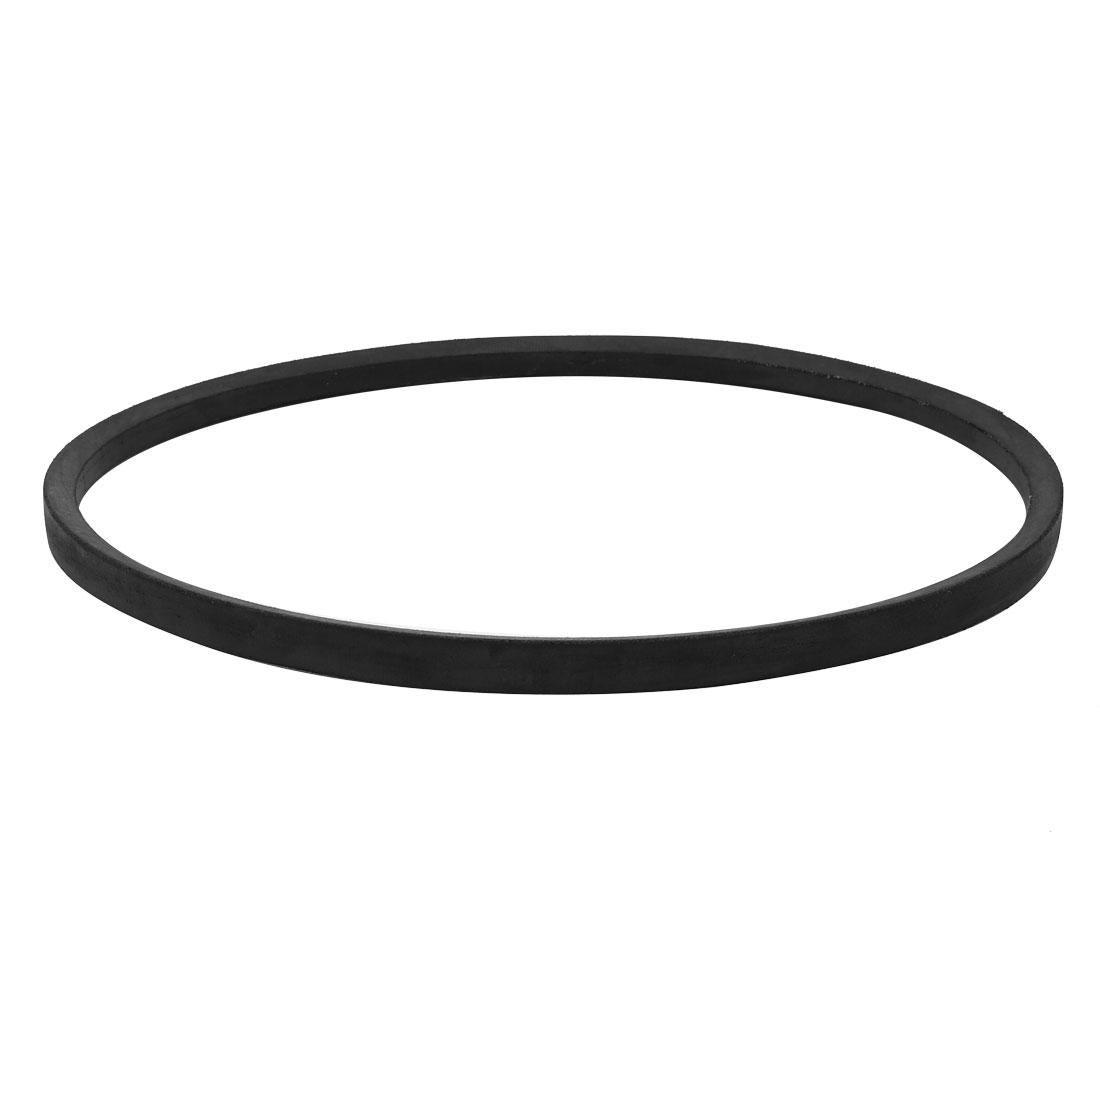 B889 17mm Width 11mm Thickness Rubber Transmission Drive V-Belt